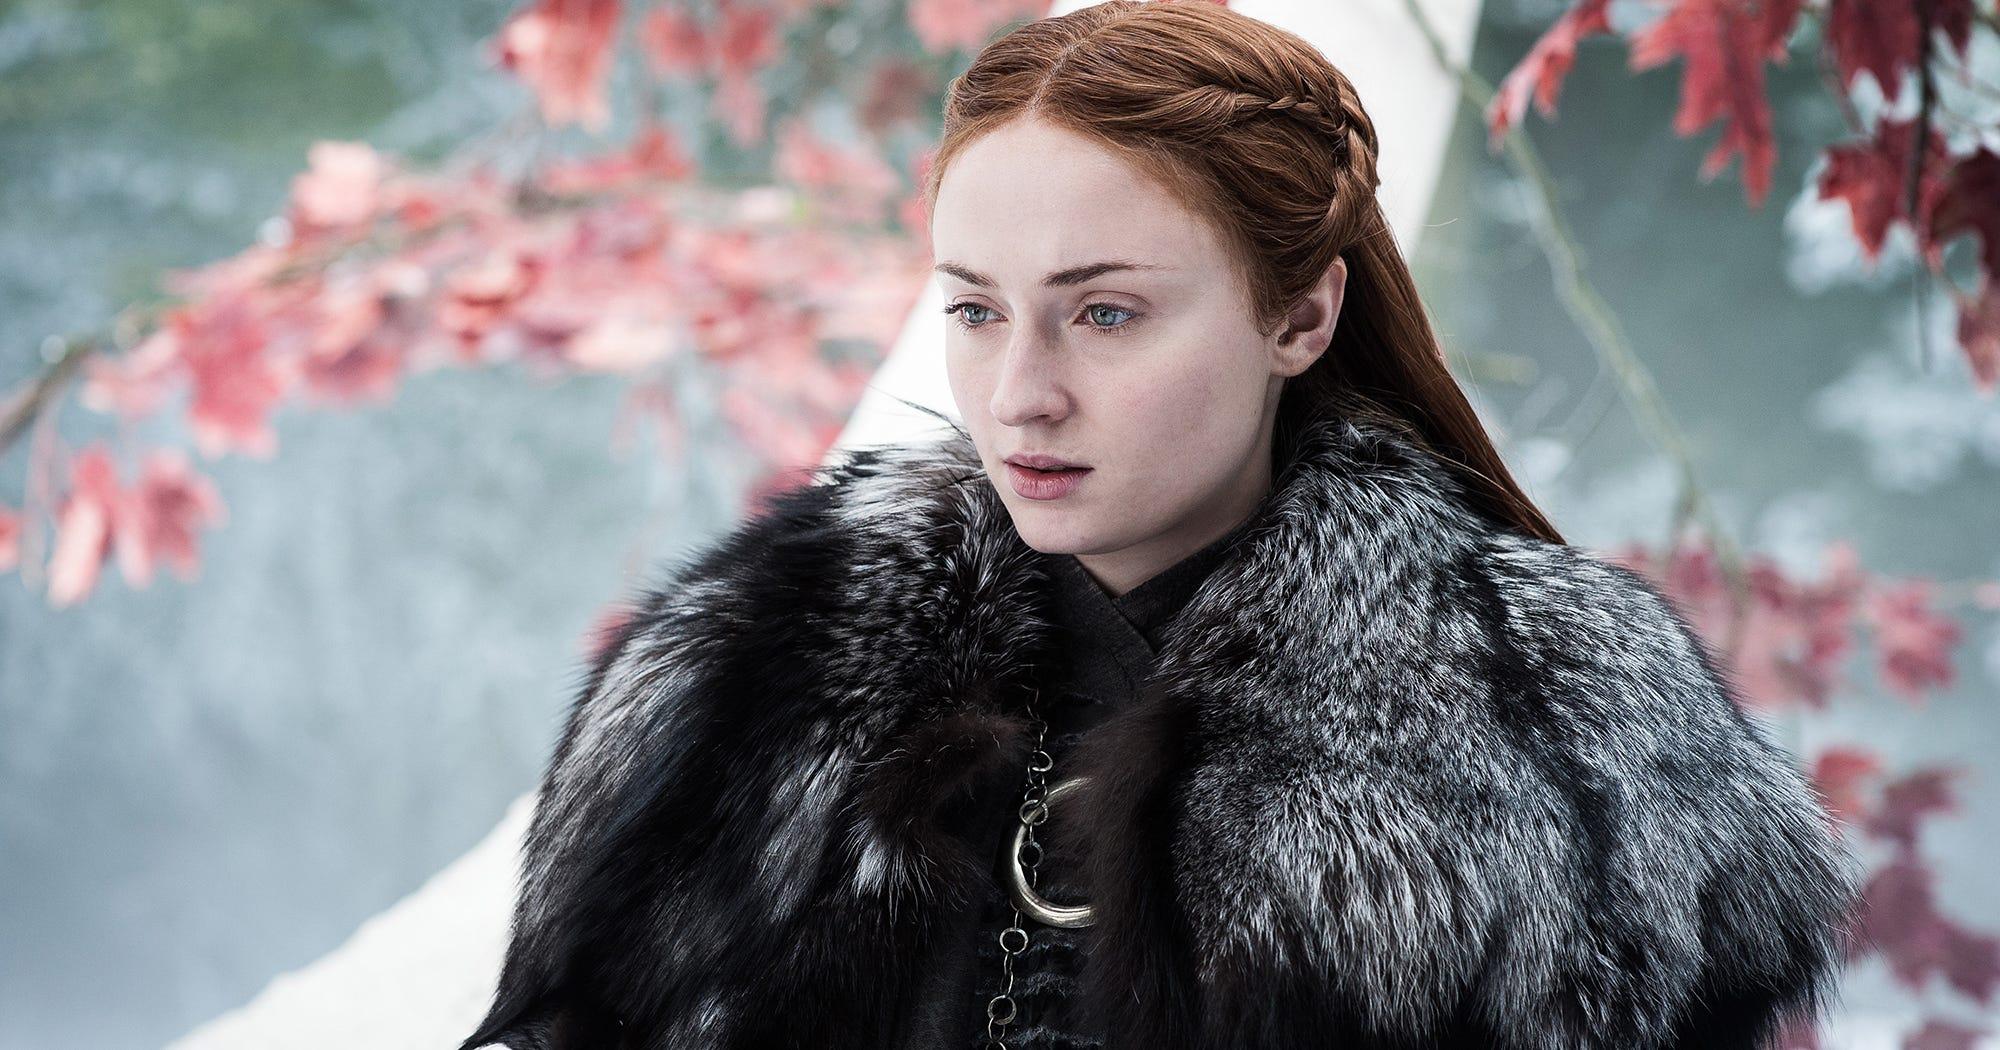 Game Of Thrones Next Episode Leaked Reddit HBO Hack